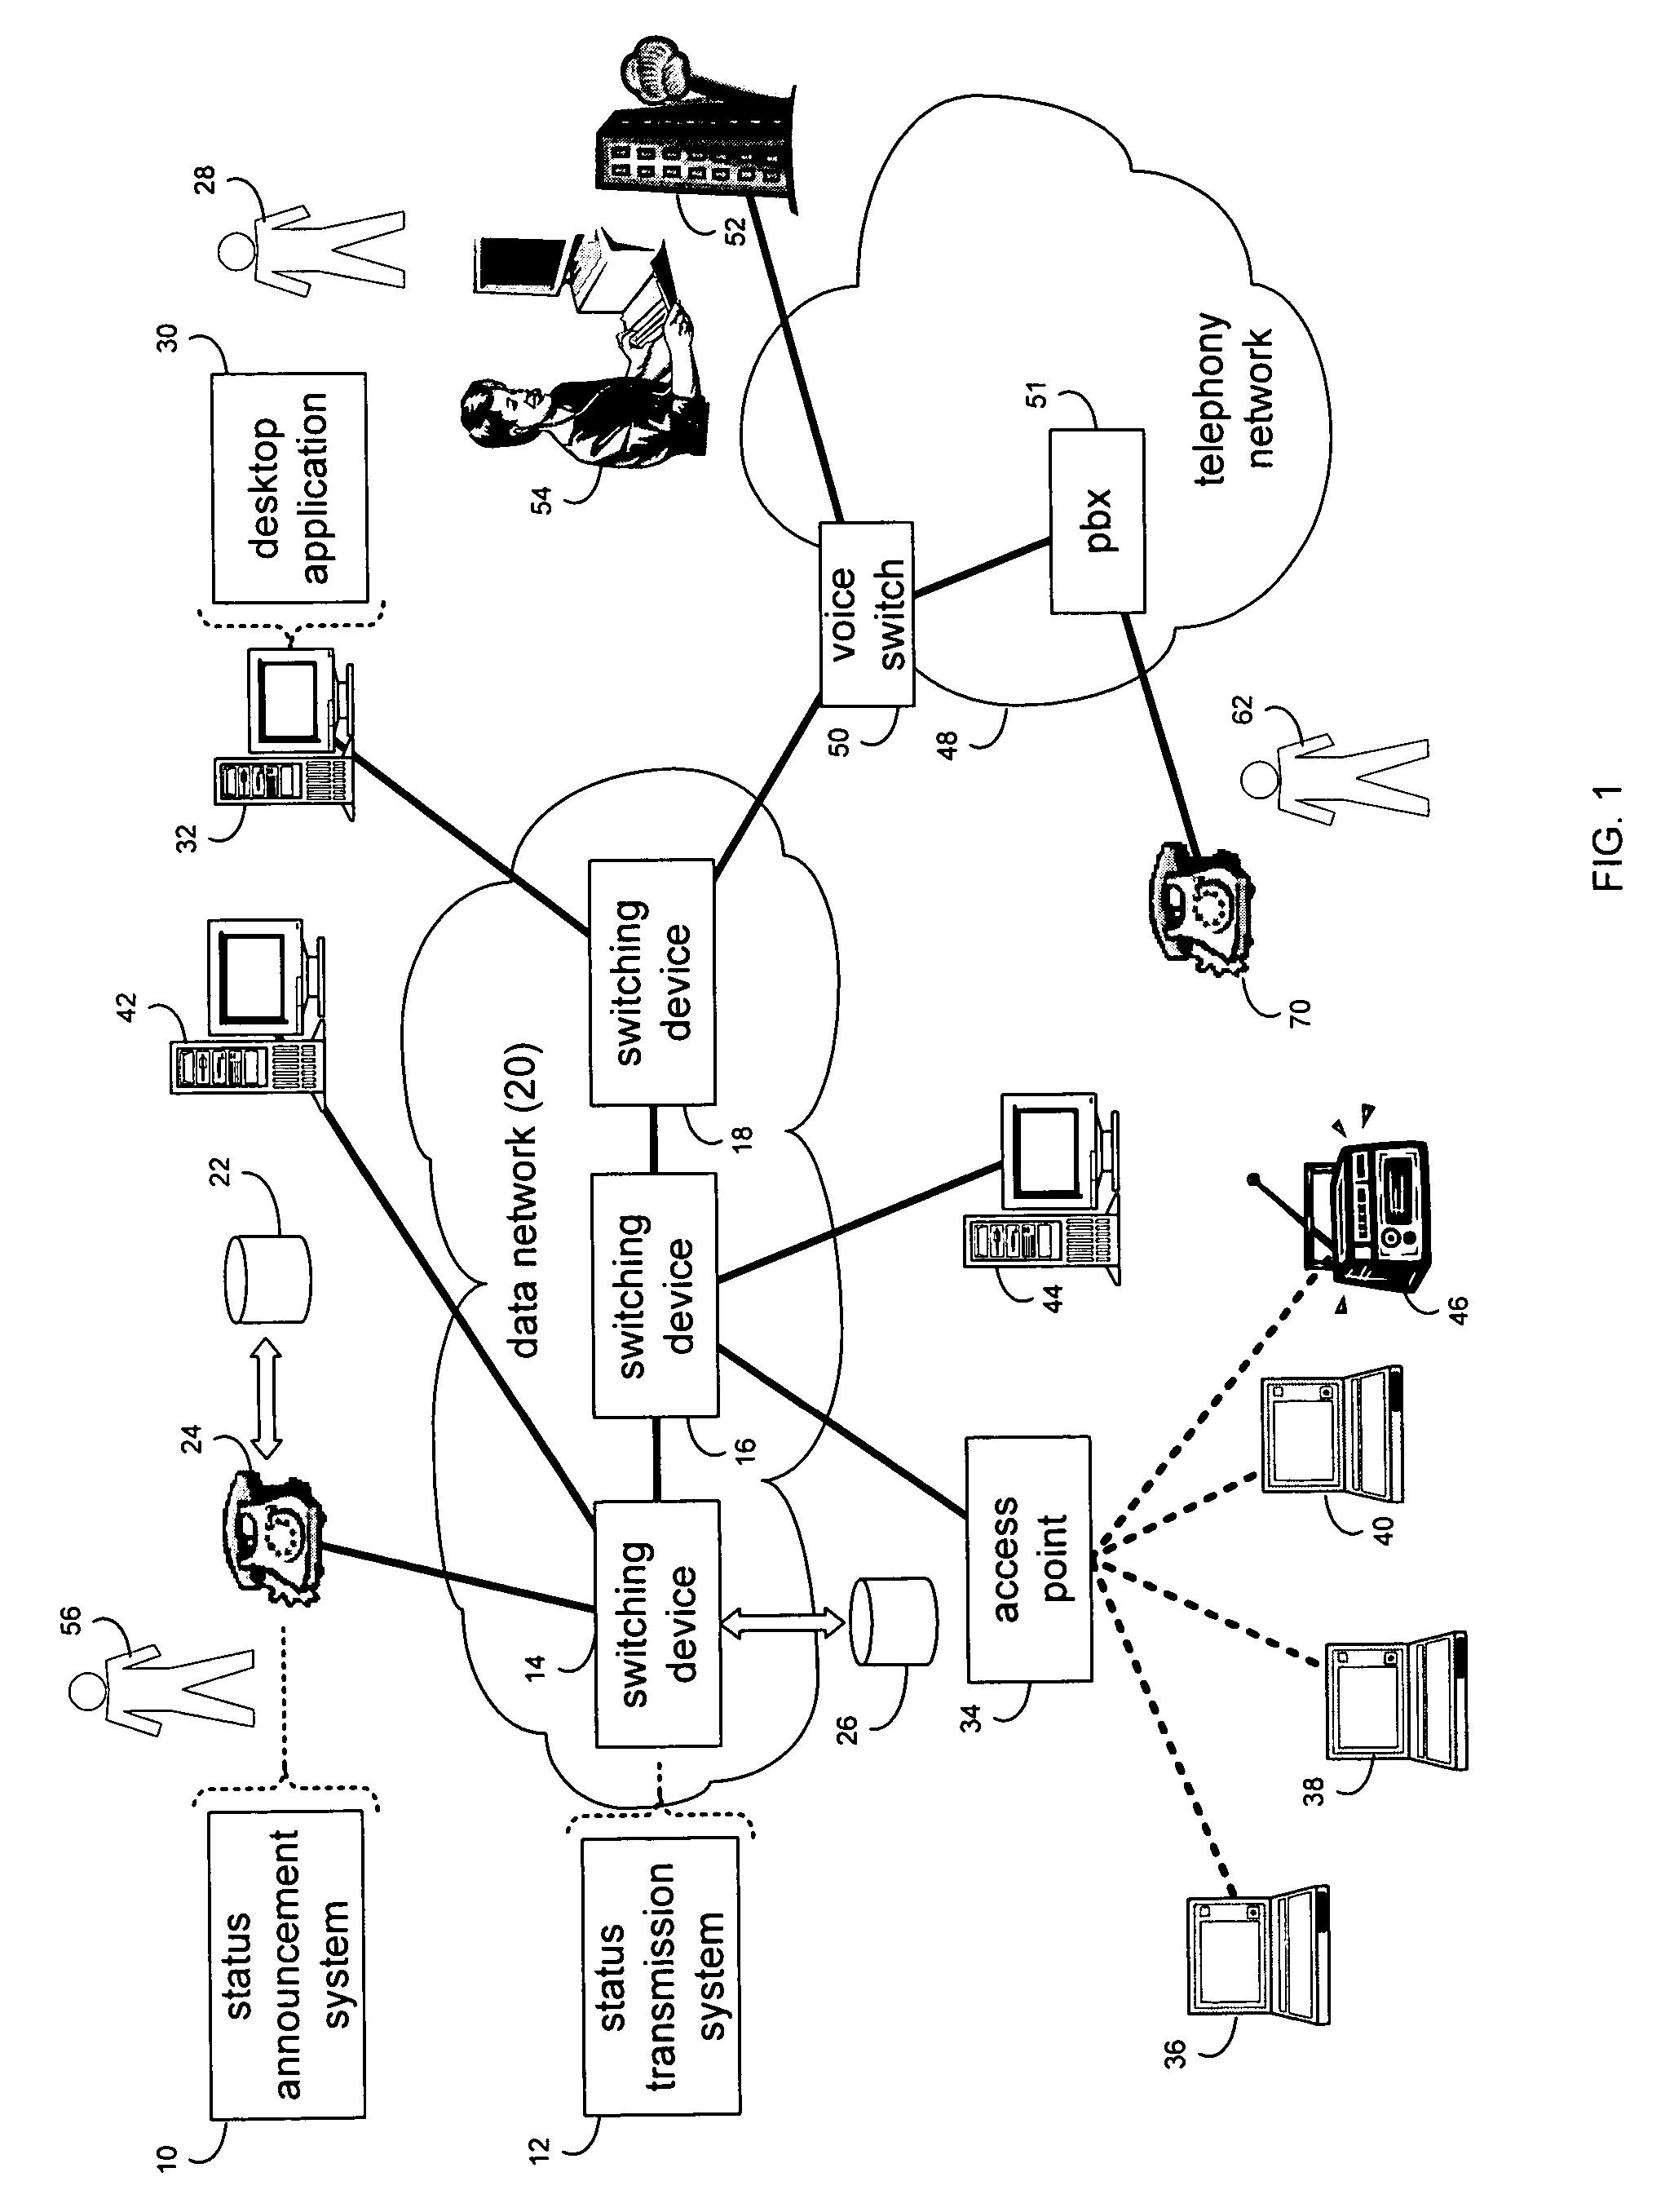 61 willys utility wagon wiring diagram willys wagon 226 wiring diagram at freeautoresponder co